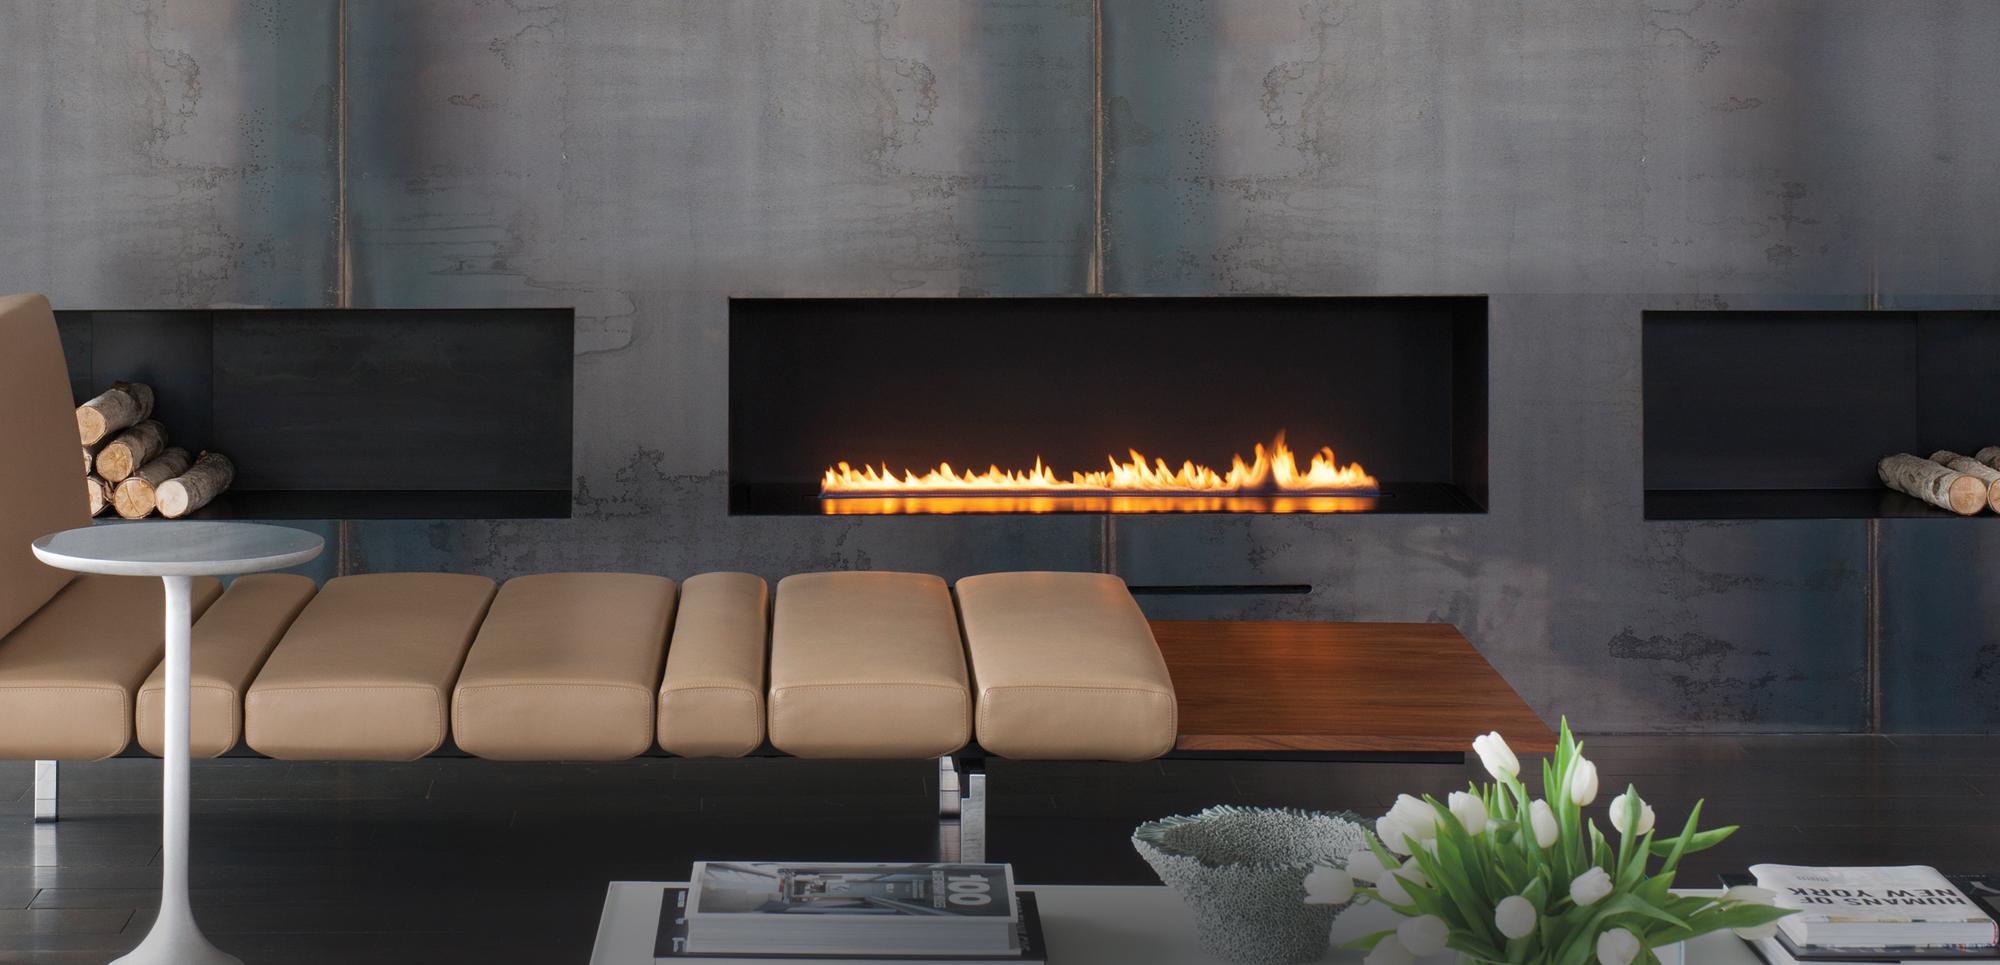 Fireplace Store asheville Inspirational Spark Modern Fires